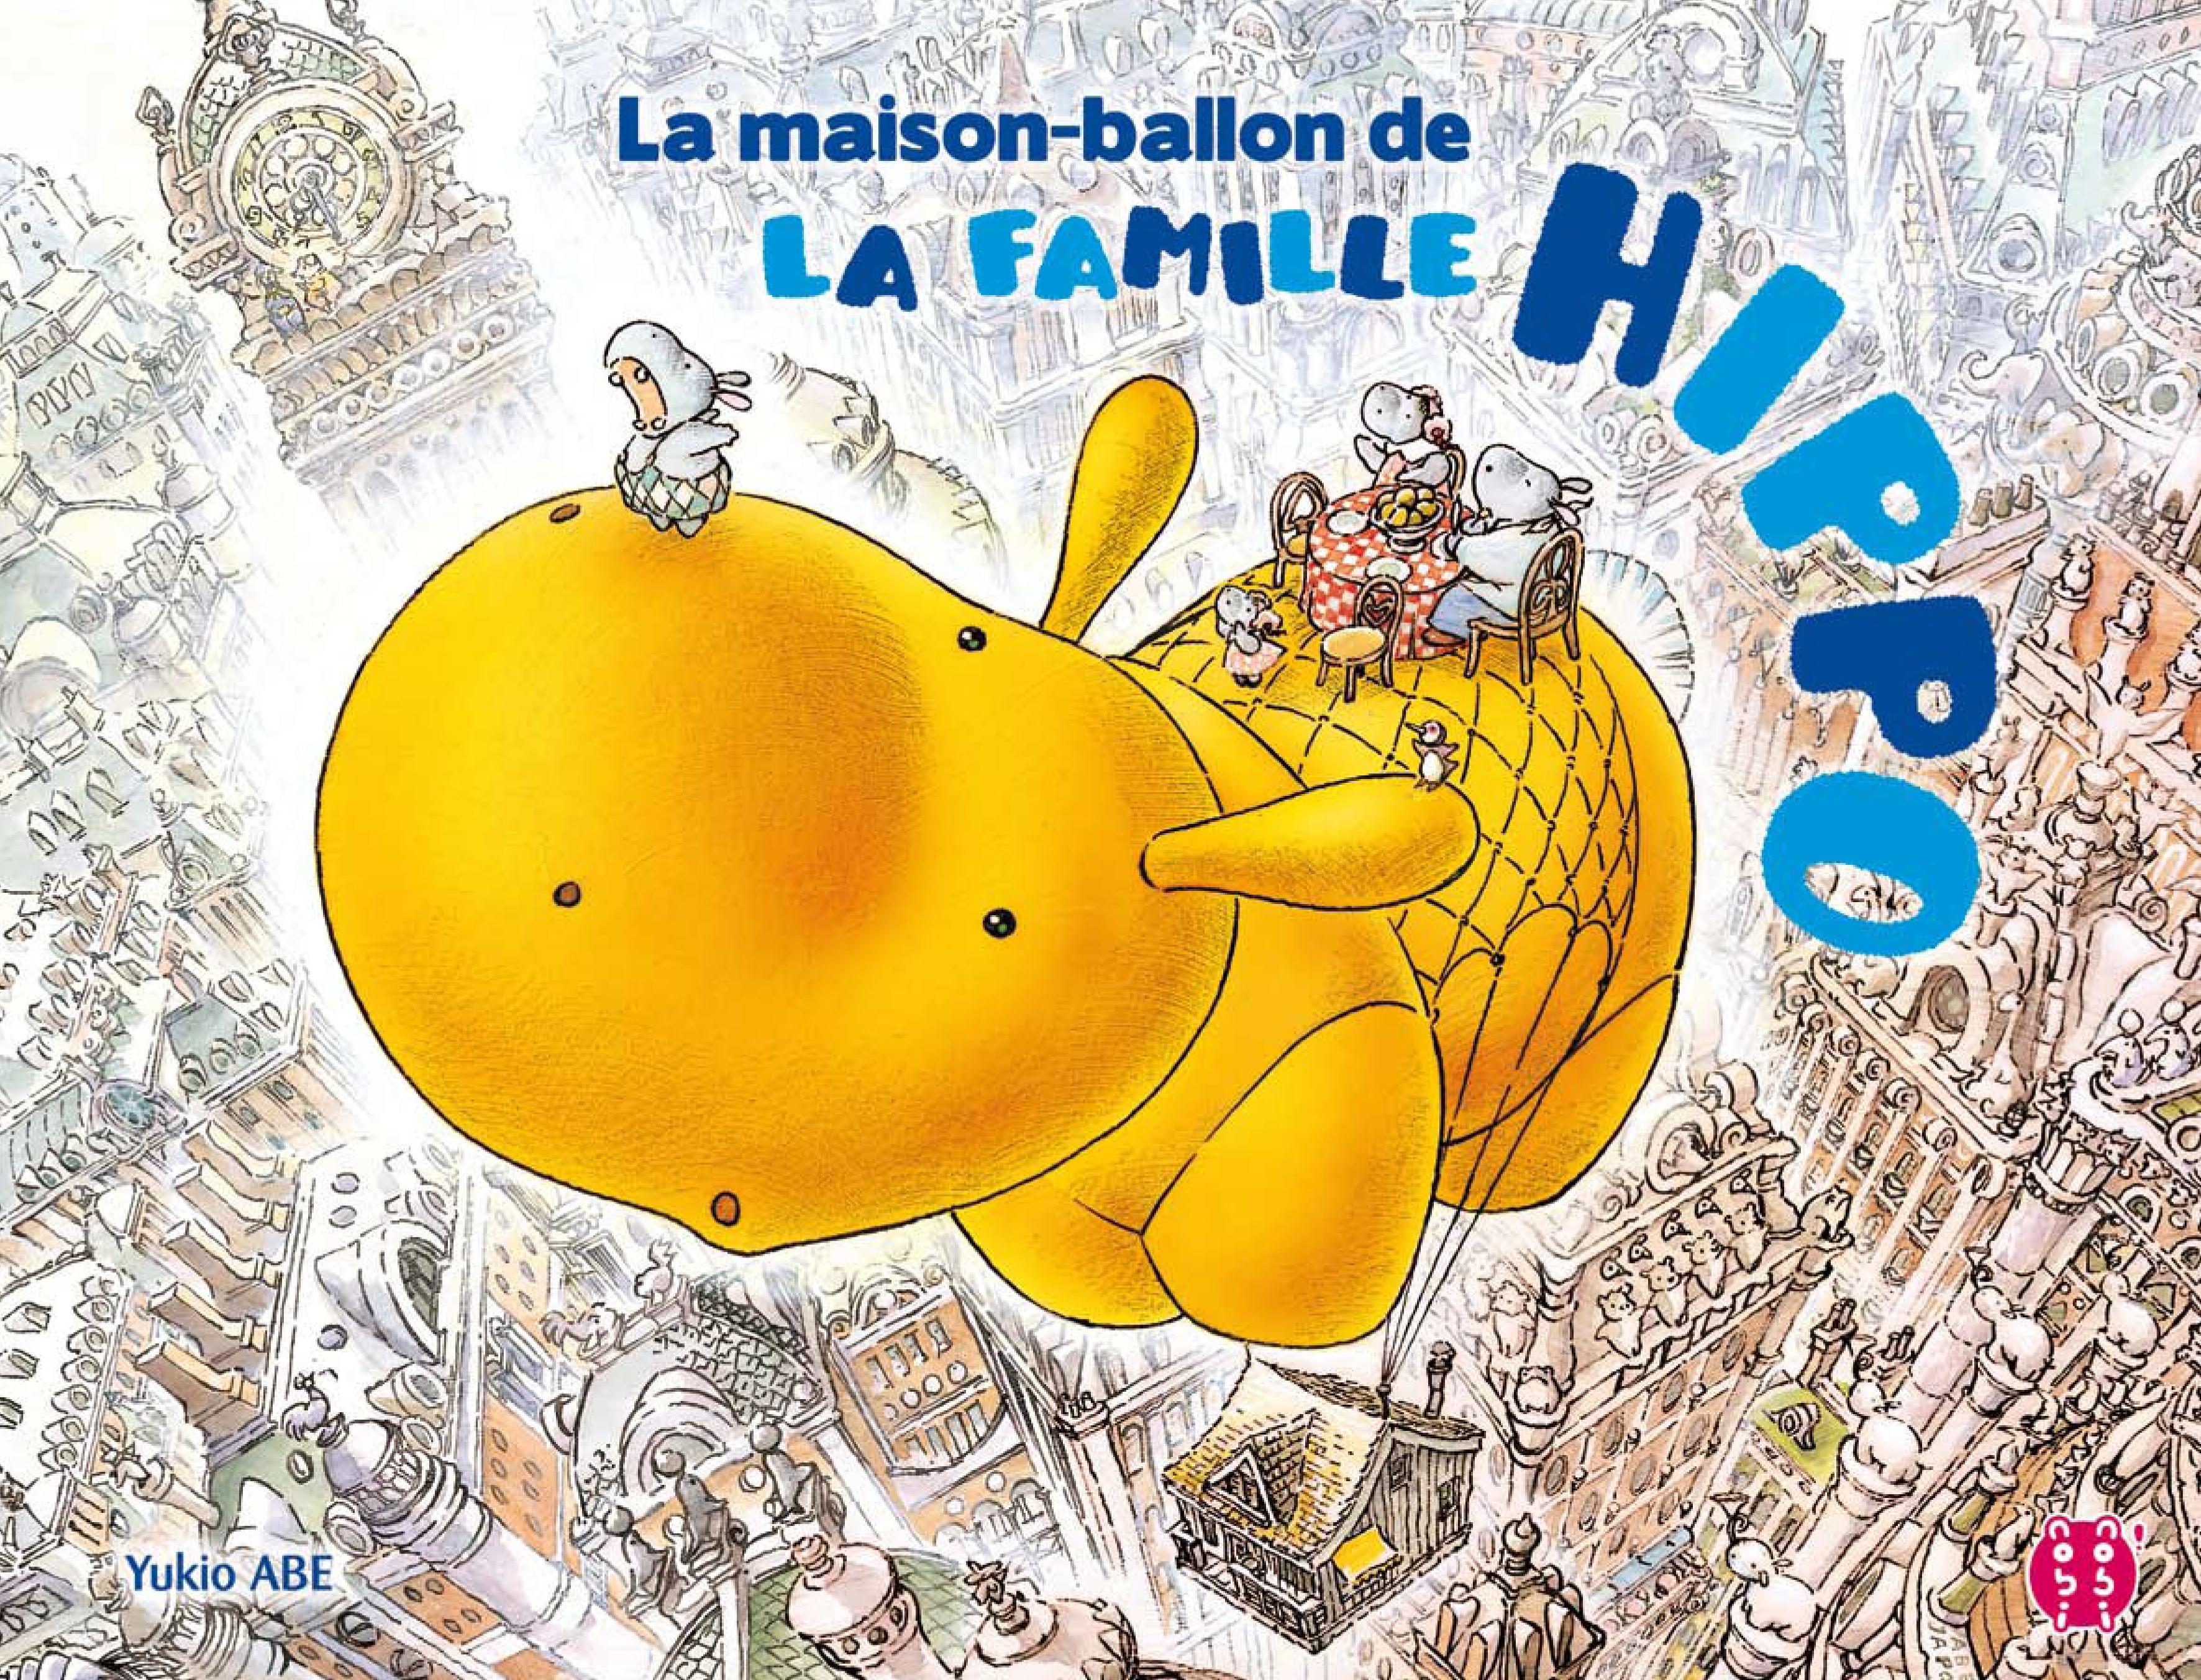 http://img.manga-sanctuary.com/big/la-maison-ballon-de-la-famille-hippo-livreillustre-volume-1-simple-72404.jpg